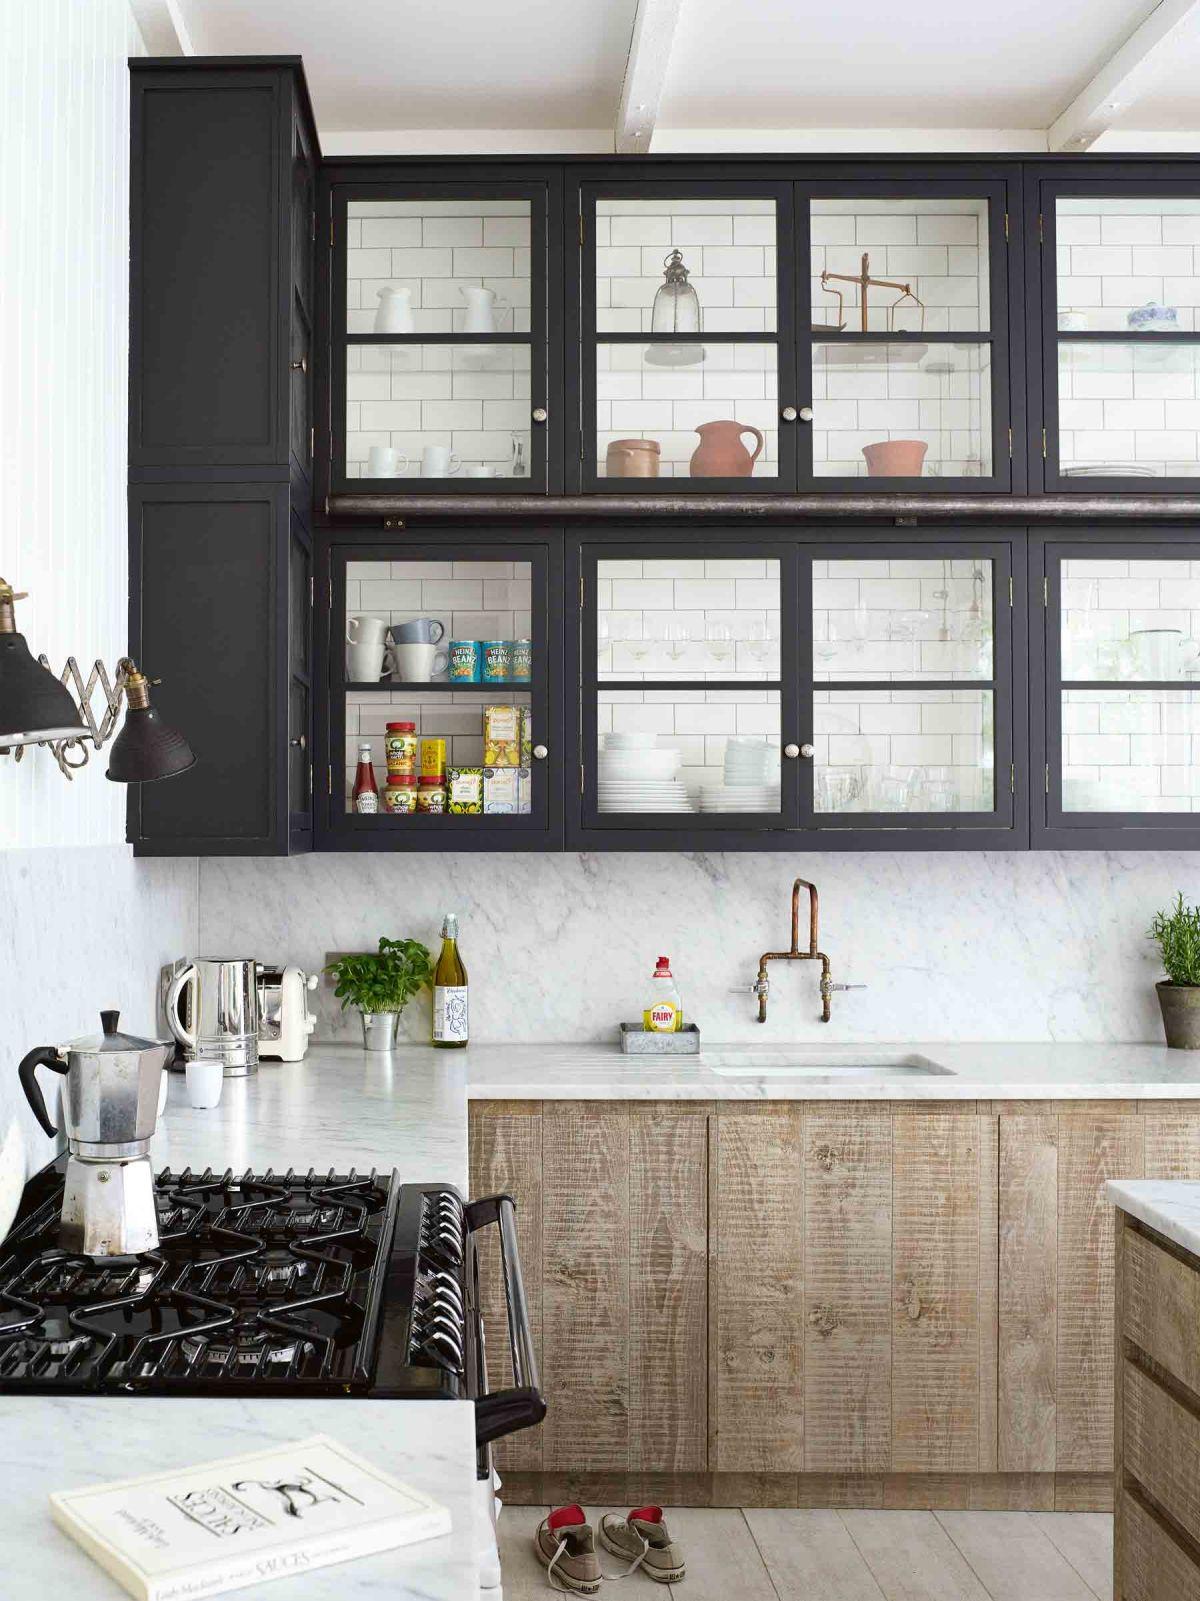 Cool Kitchen Tile Ideas To Suit Stylish Modern Homes Livingetc Livingetcdocument Documenttype